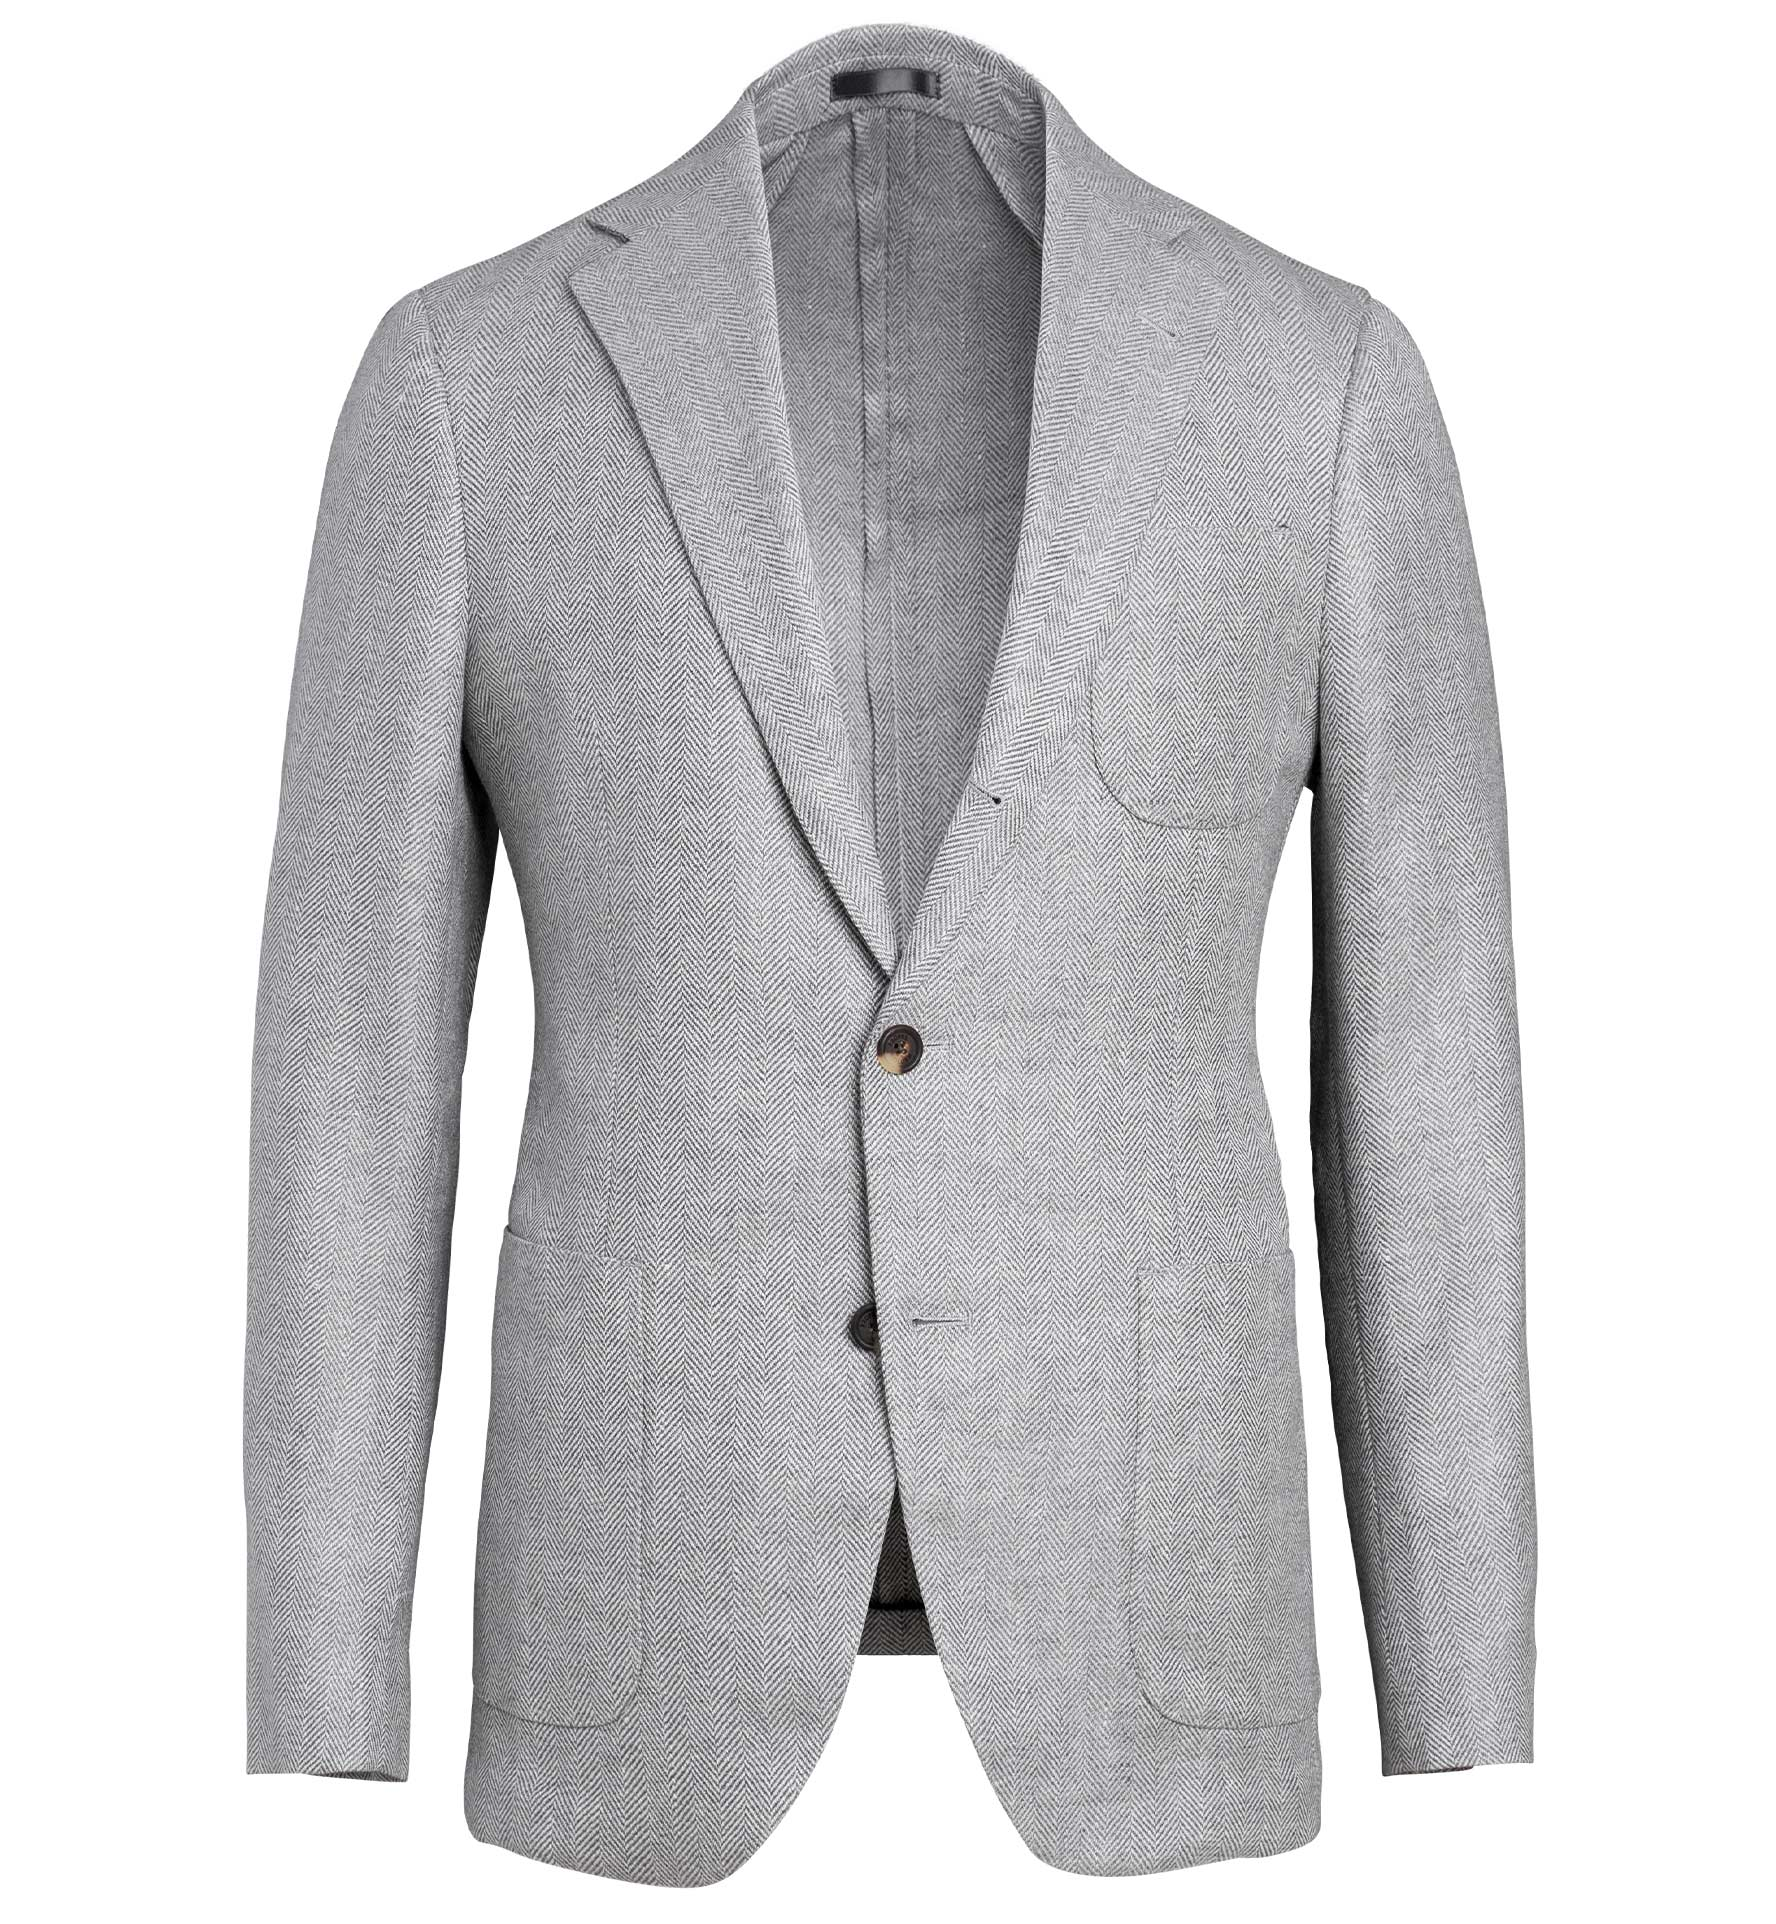 Zoom Image of Bedford Light Grey Wool and Linen Herringbone Jacket